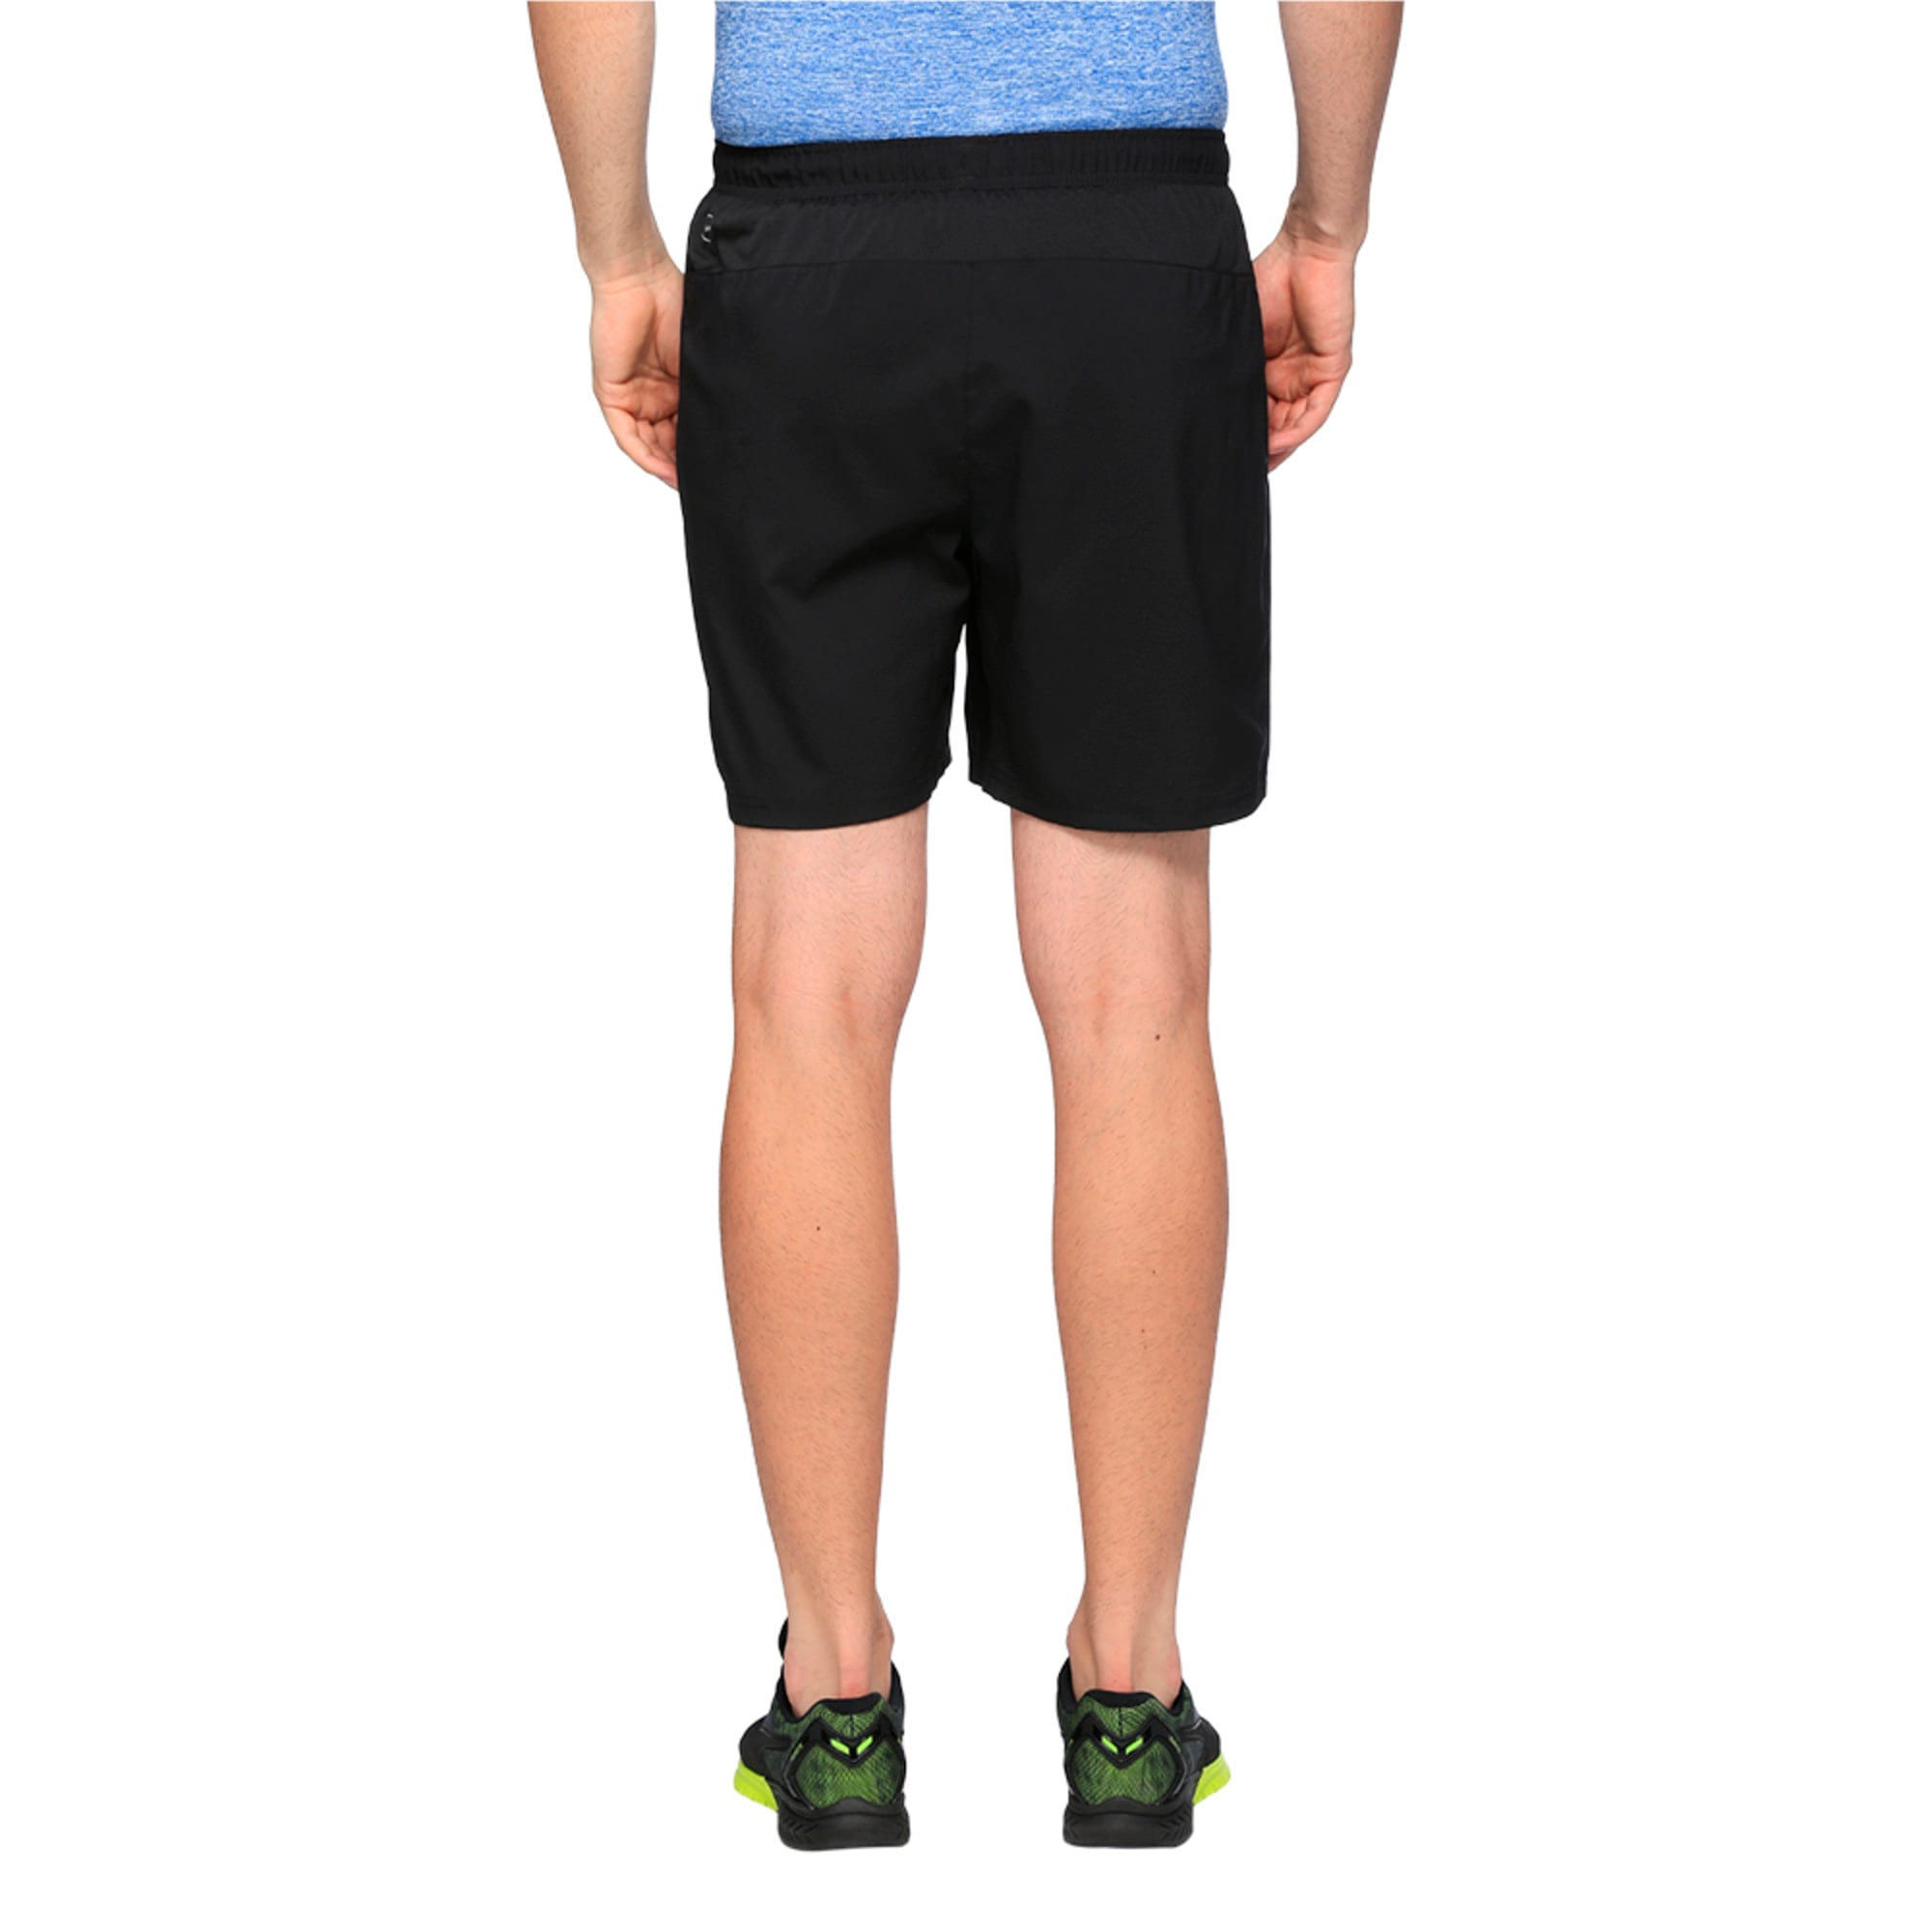 "Thumbnail 5 of Core-Run 7"" Shorts, Puma Black, medium-IND"